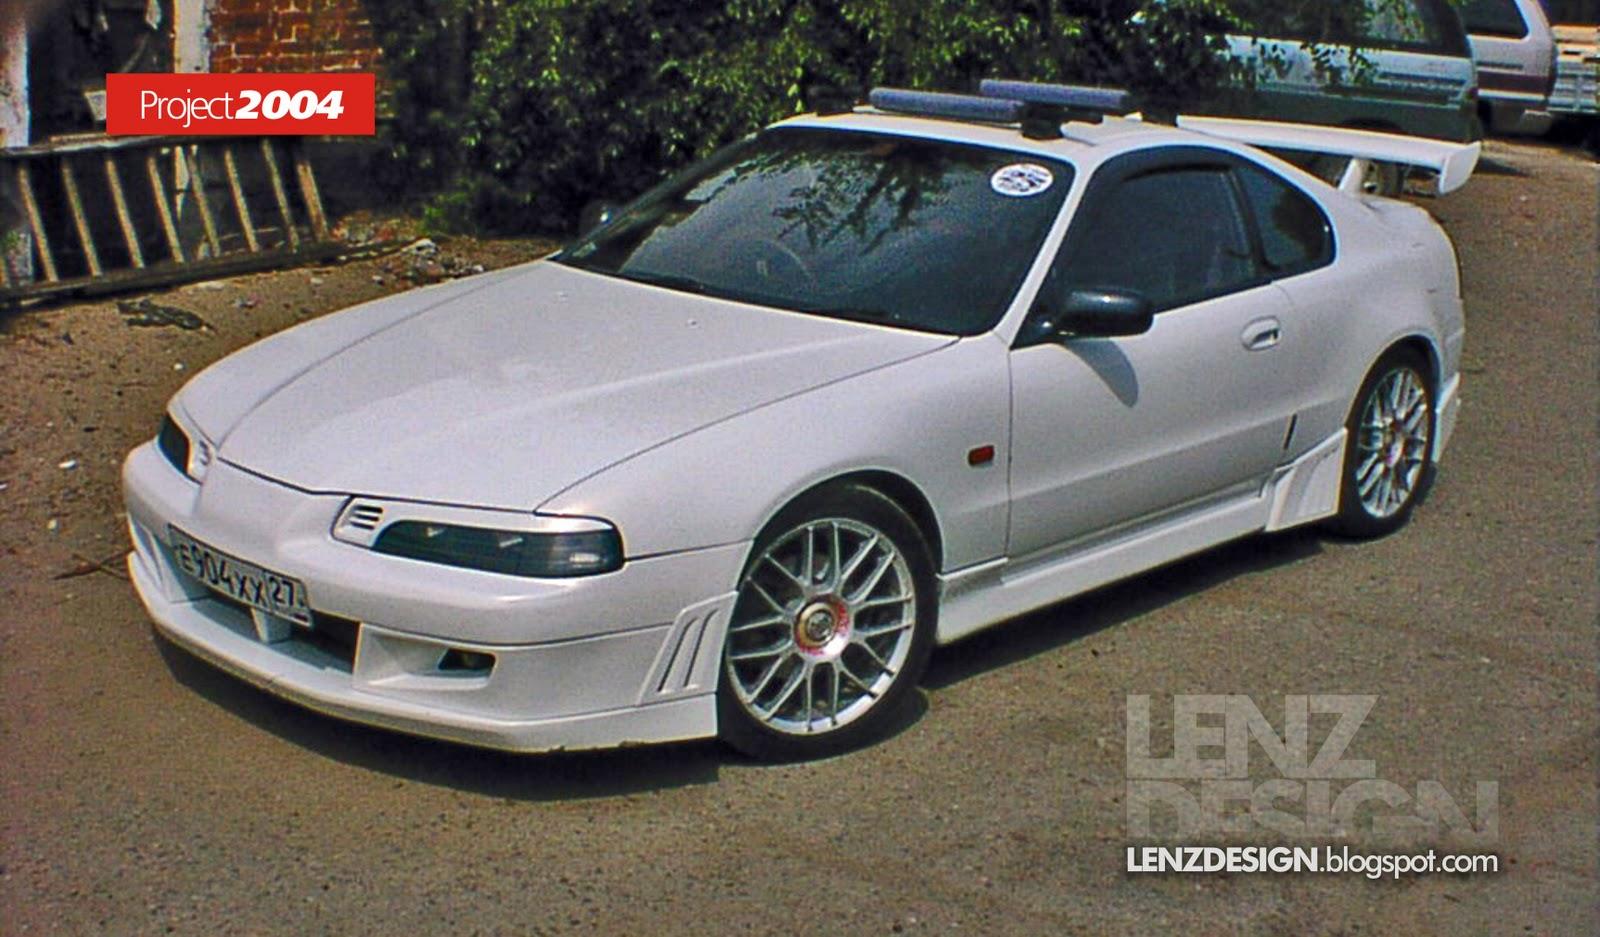 Honda Prelude Tuning By Lenzdesign